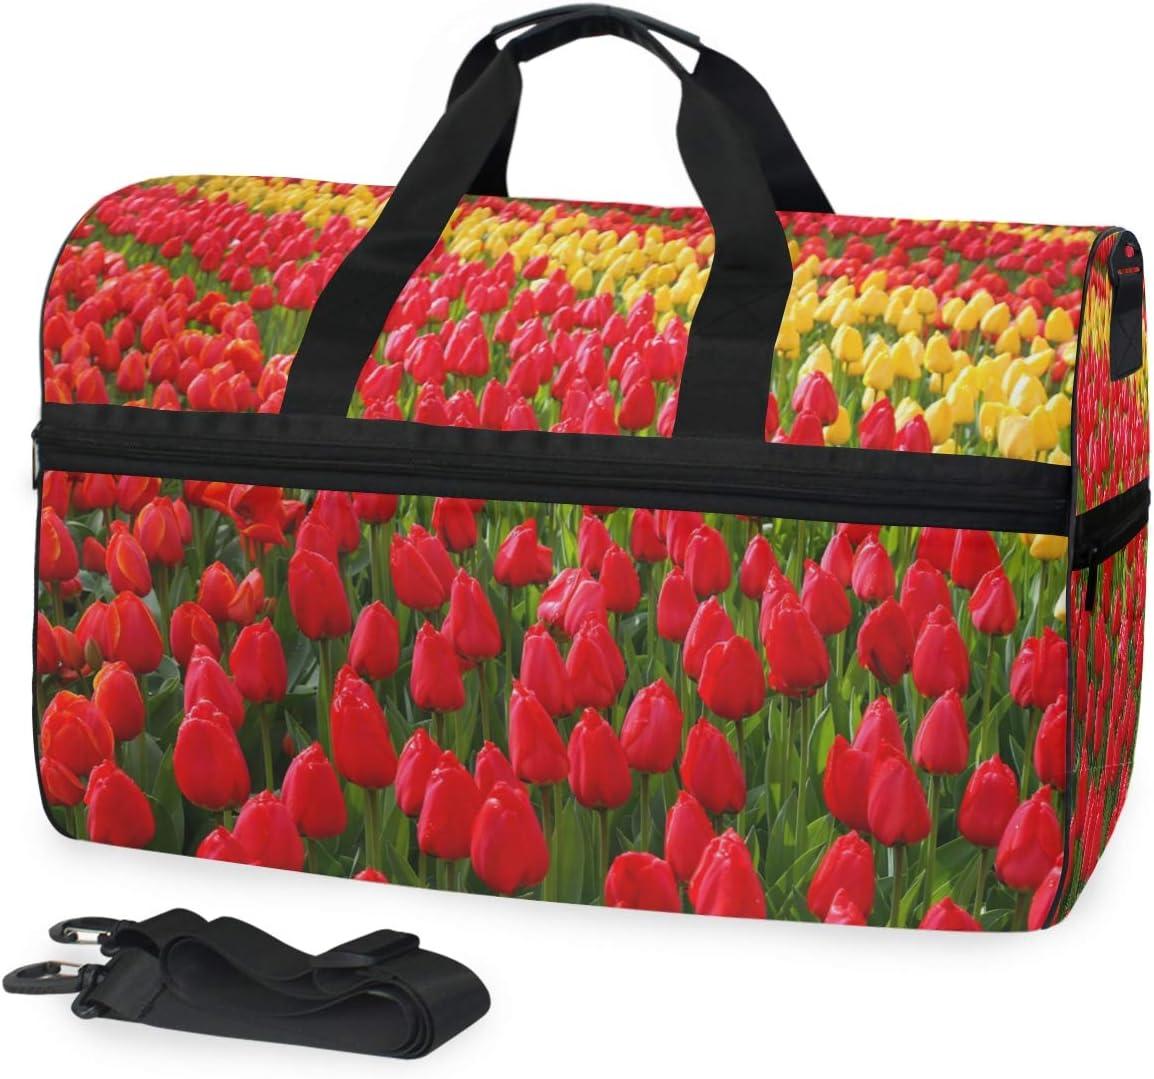 FAJRO Duffle Bag for Women Men Tulip Flower Sea Travel Duffel Bag Large Size Water-proof Tear Resistant